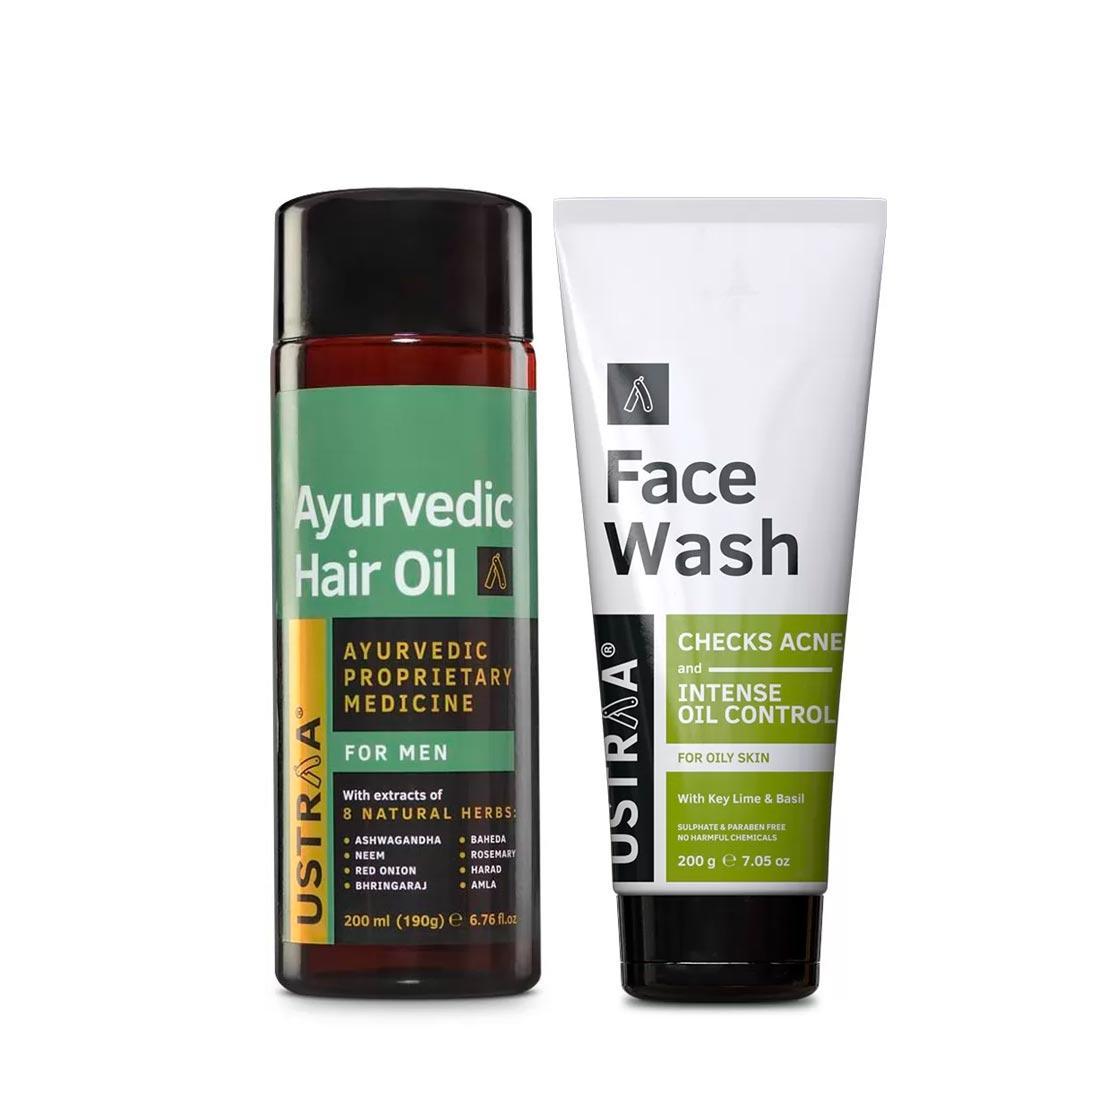 Ayurvedic Hair Oil & Face Wash - Oily Skin